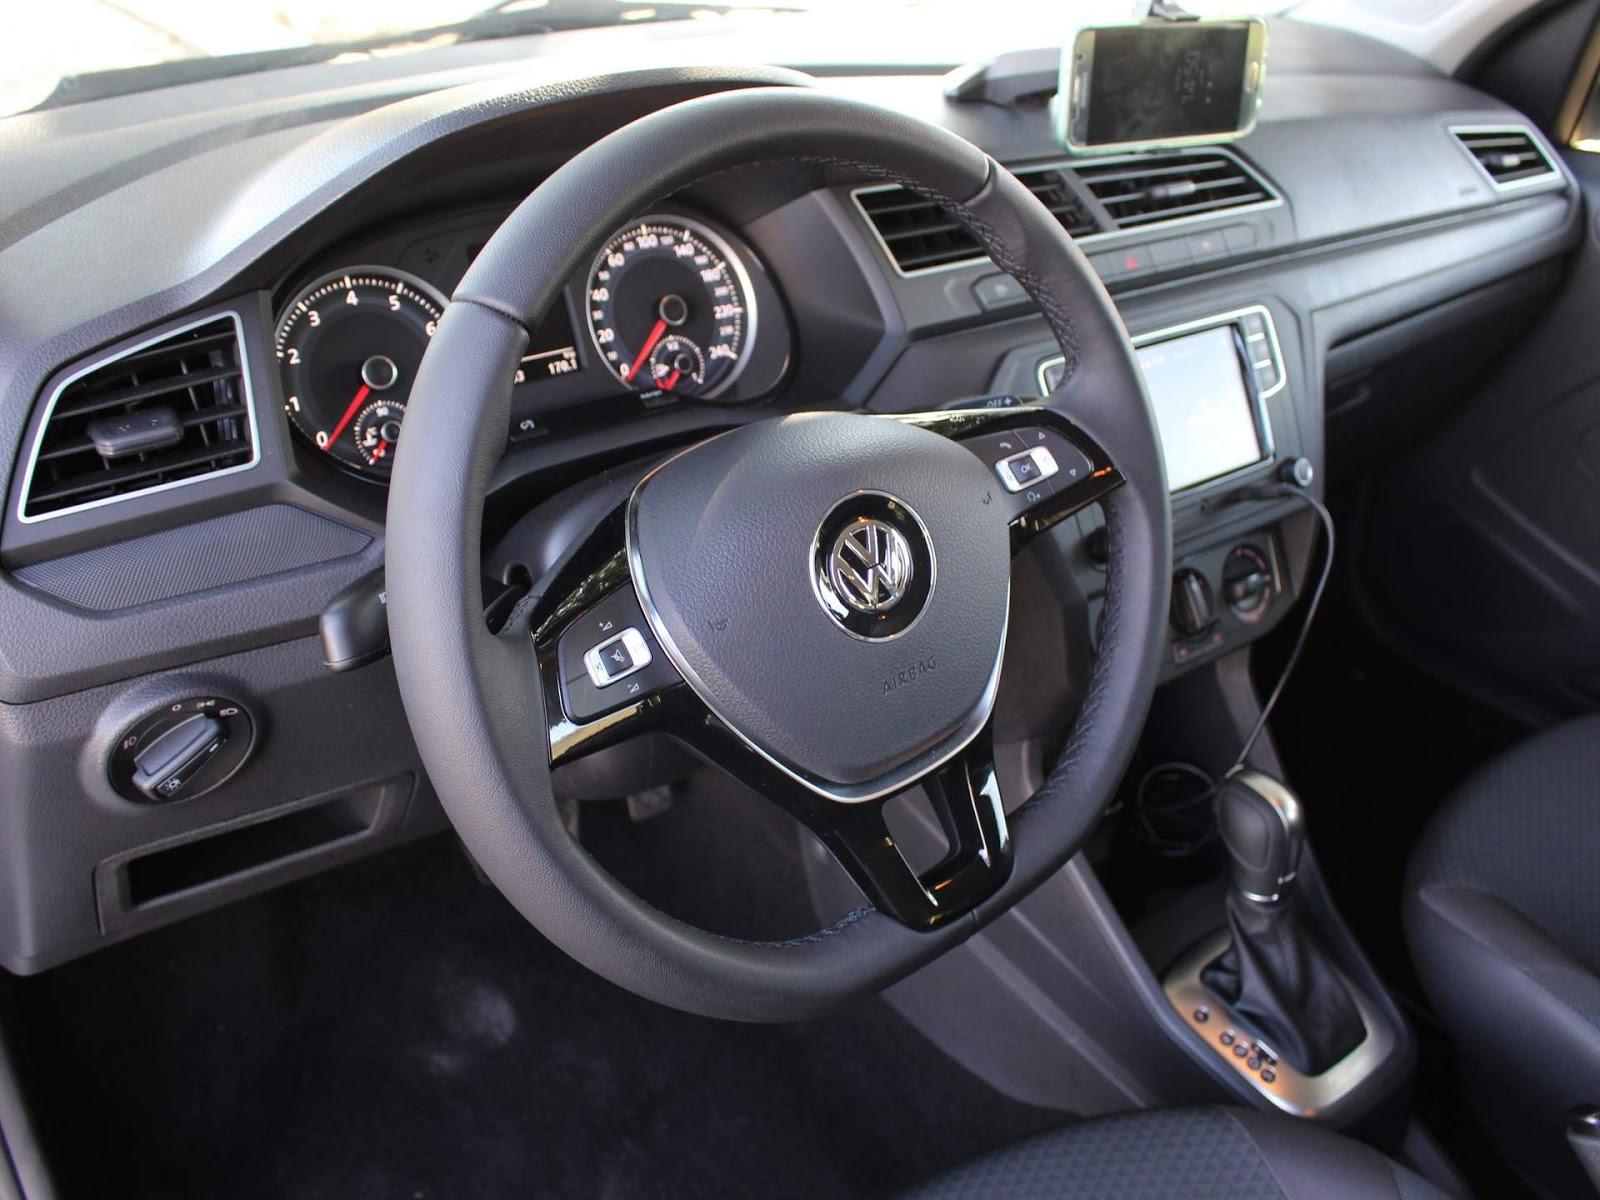 Volkswagen suspende vendas para locadoras até abril de 2021